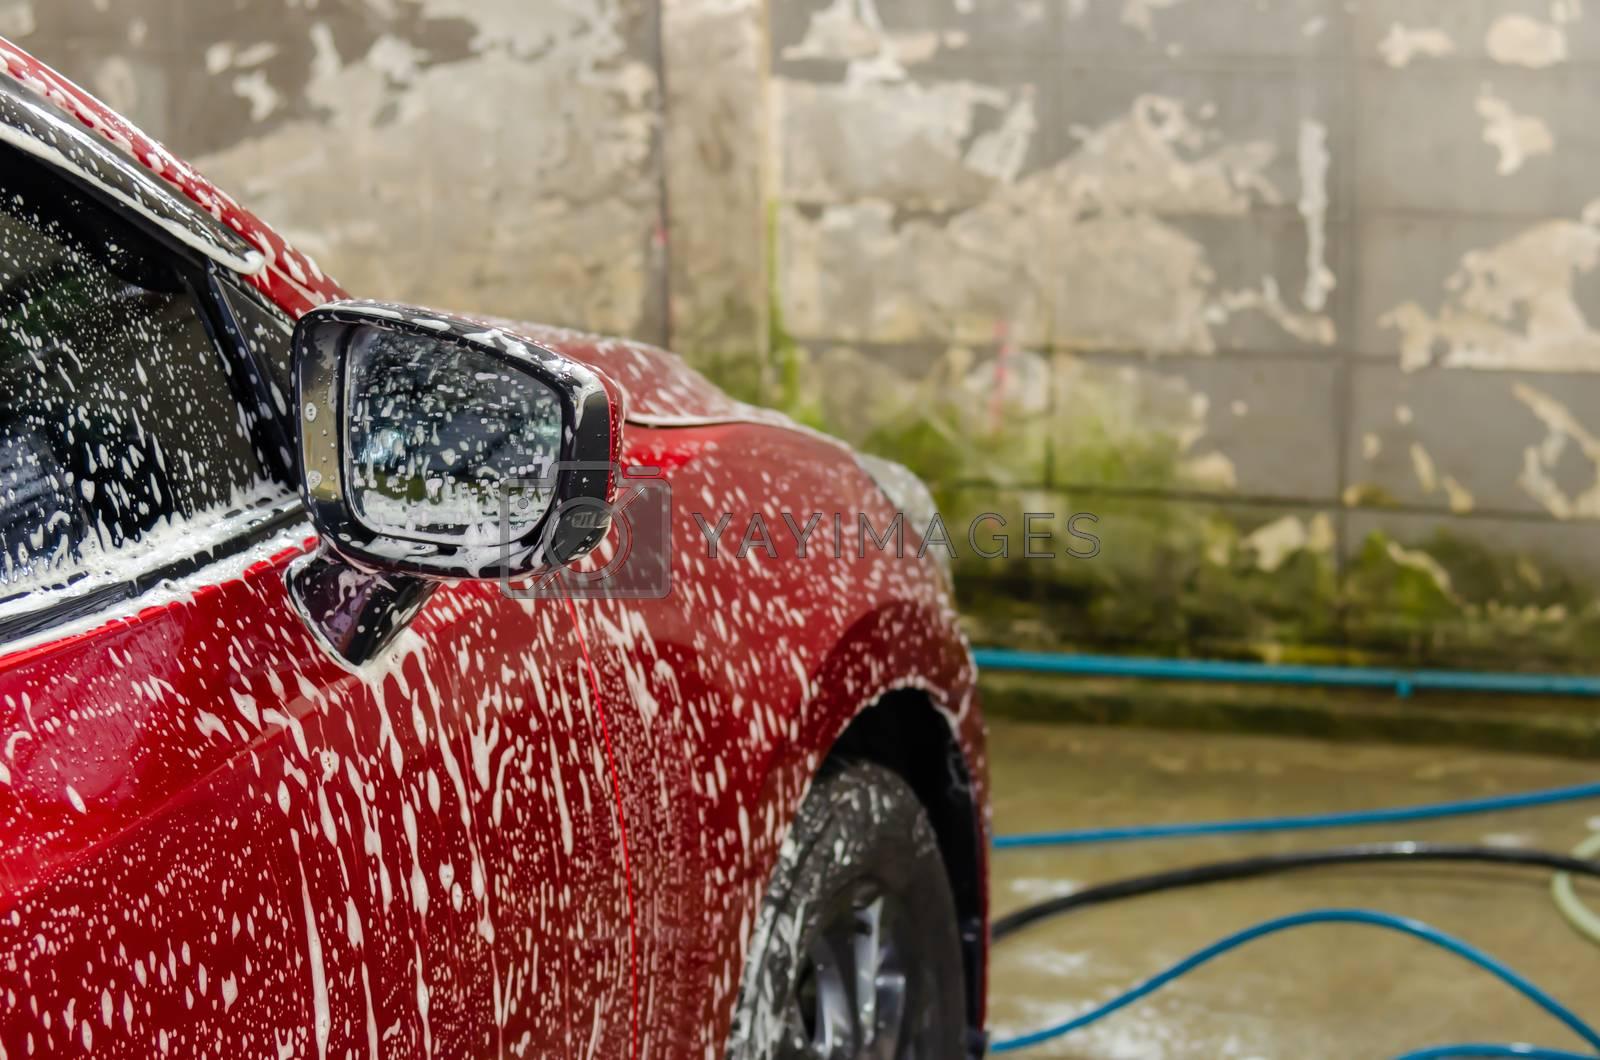 Car wash with foam bubbles.